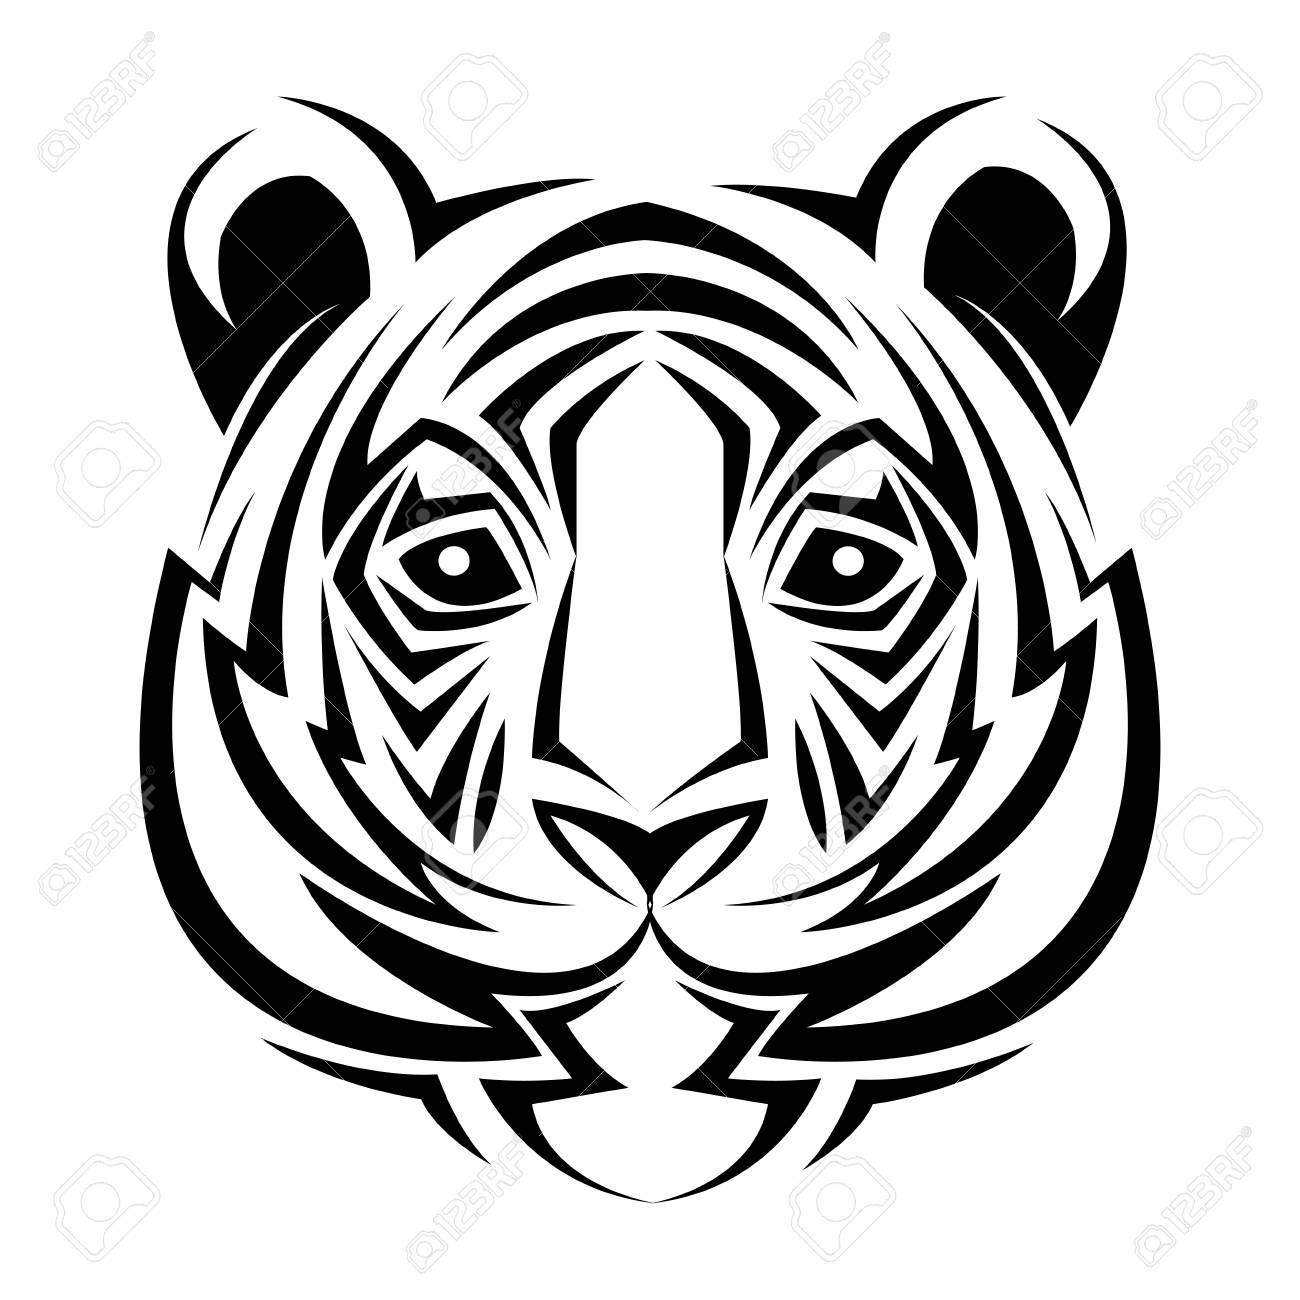 Tatuaje Tigre Tribal tigre tribal tatuaje creatividad animal diseño ilustración vectorial